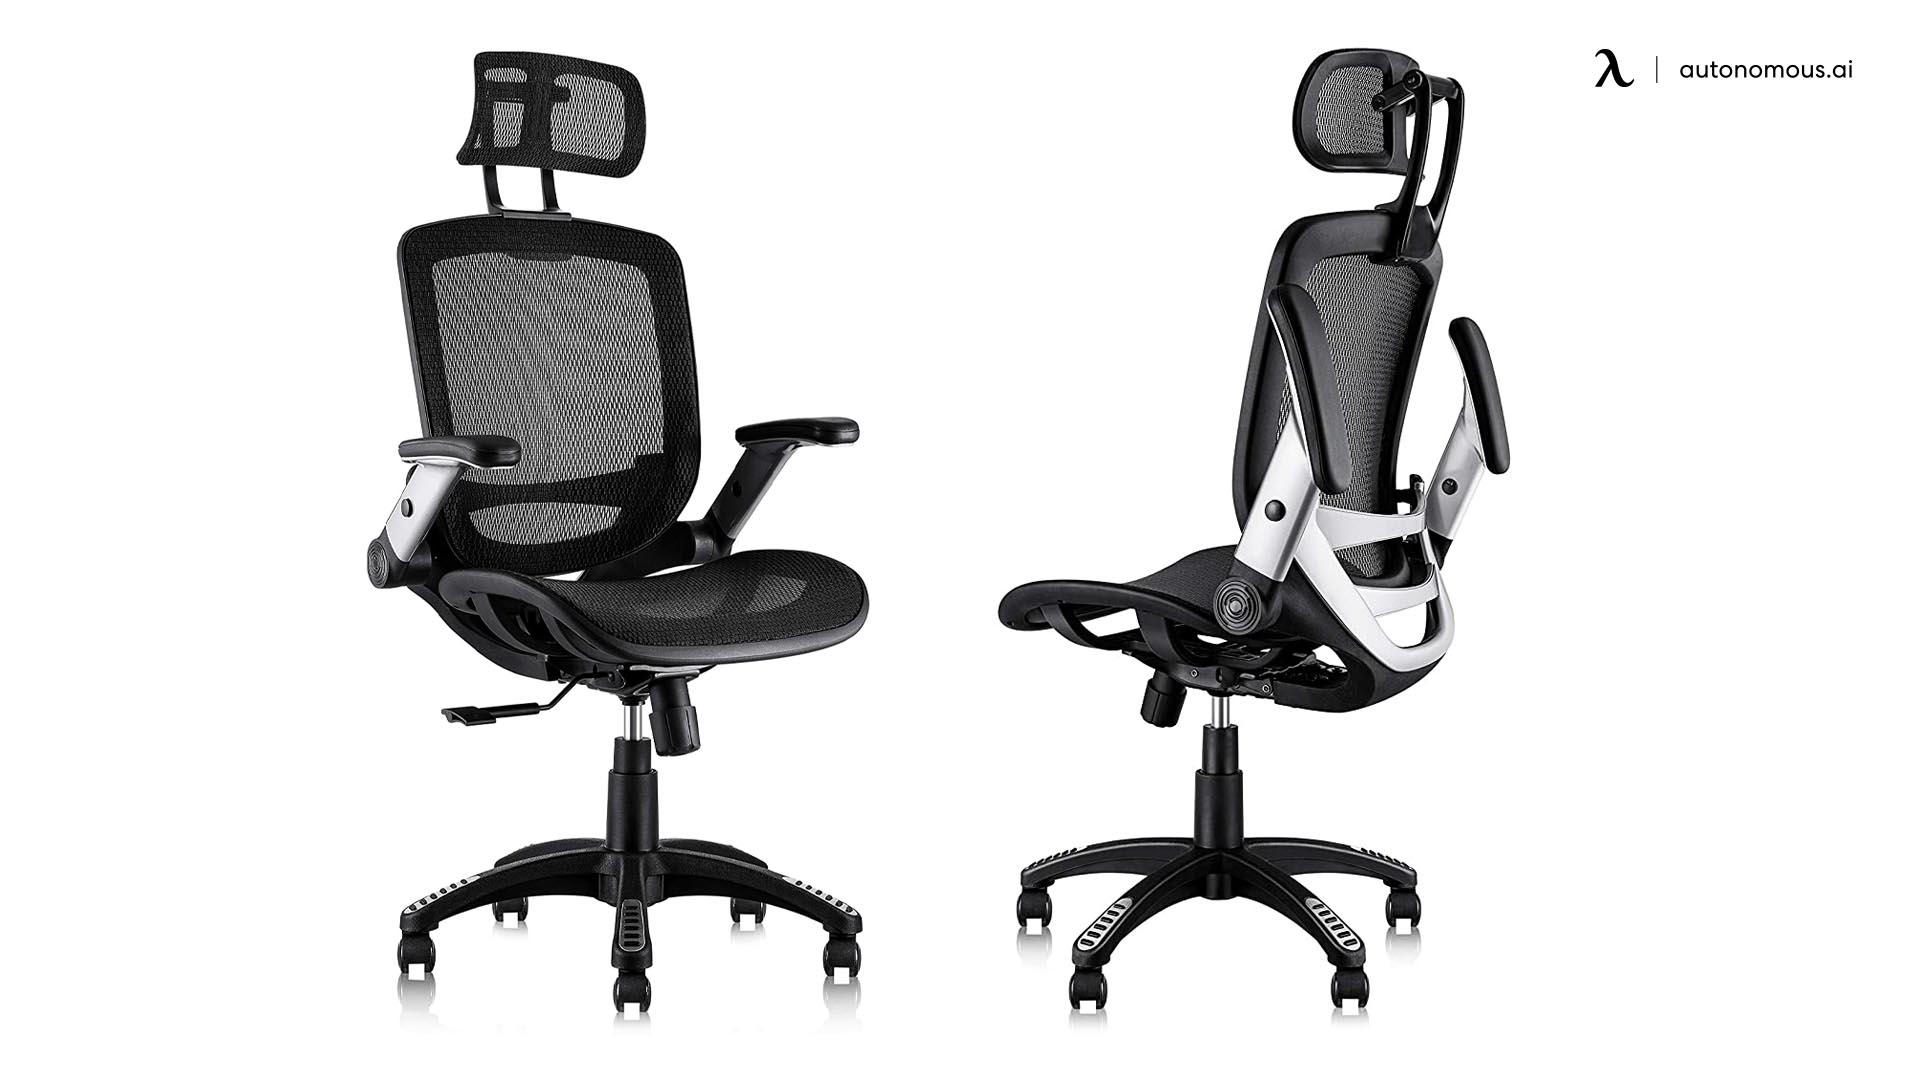 Gabrylly Mesh of Office Chair